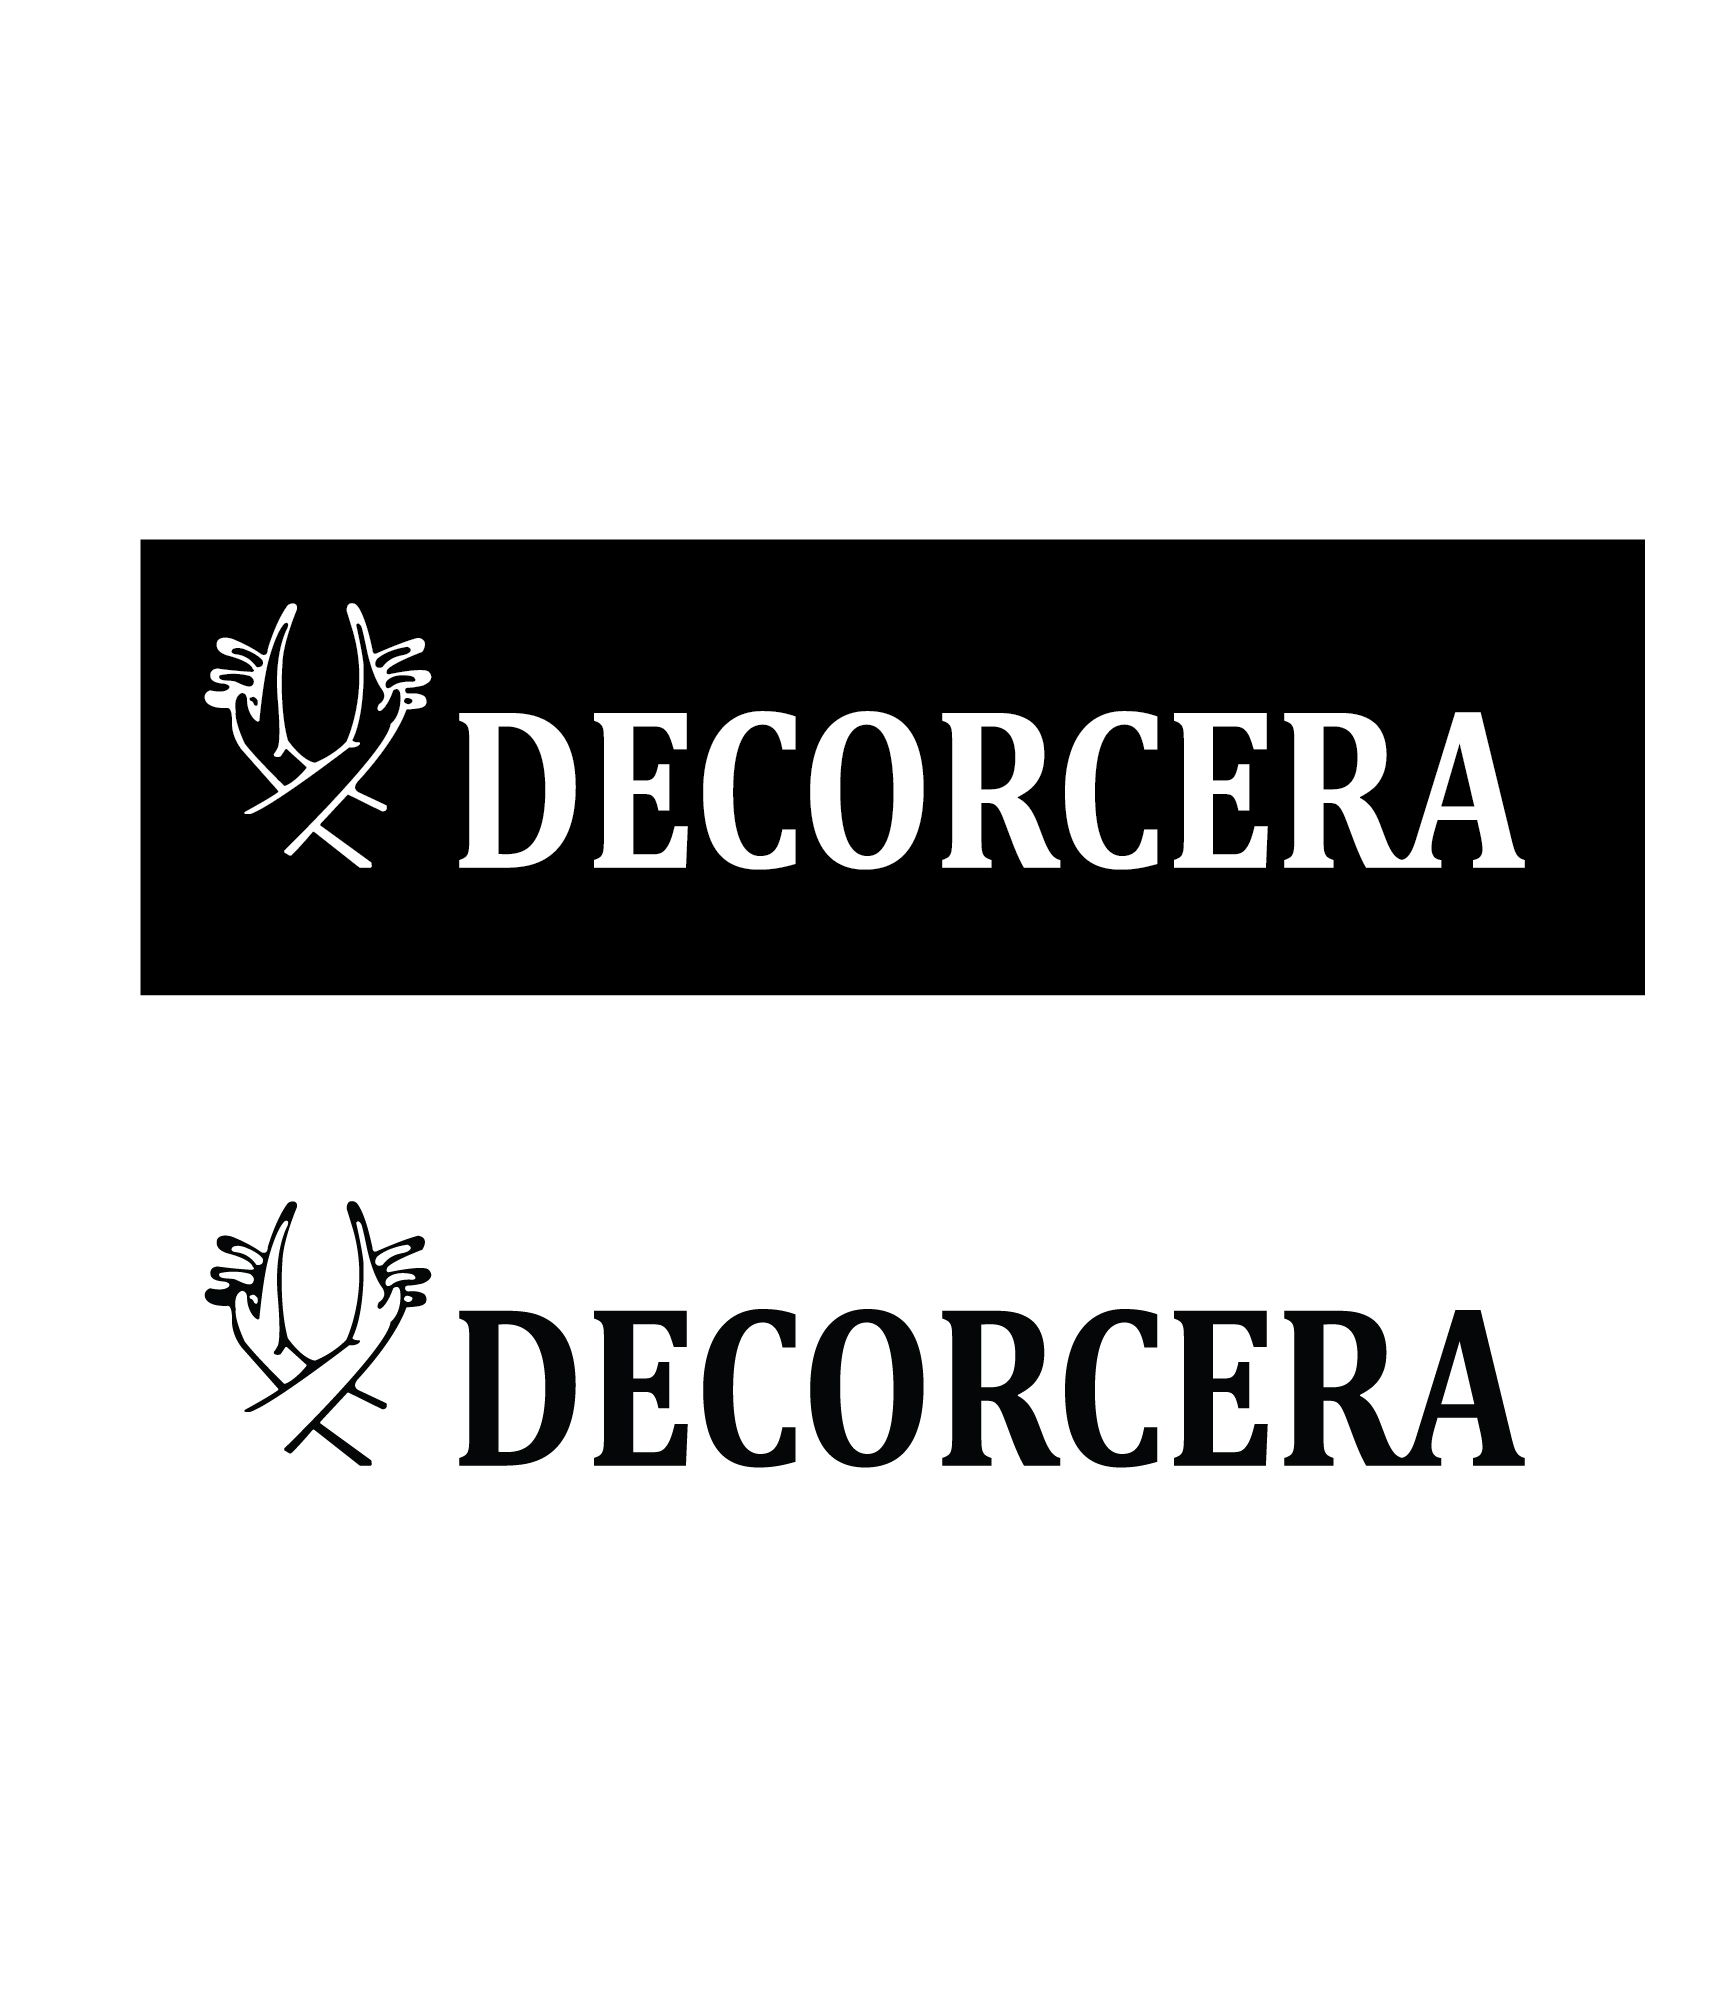 Decor Cera LTD